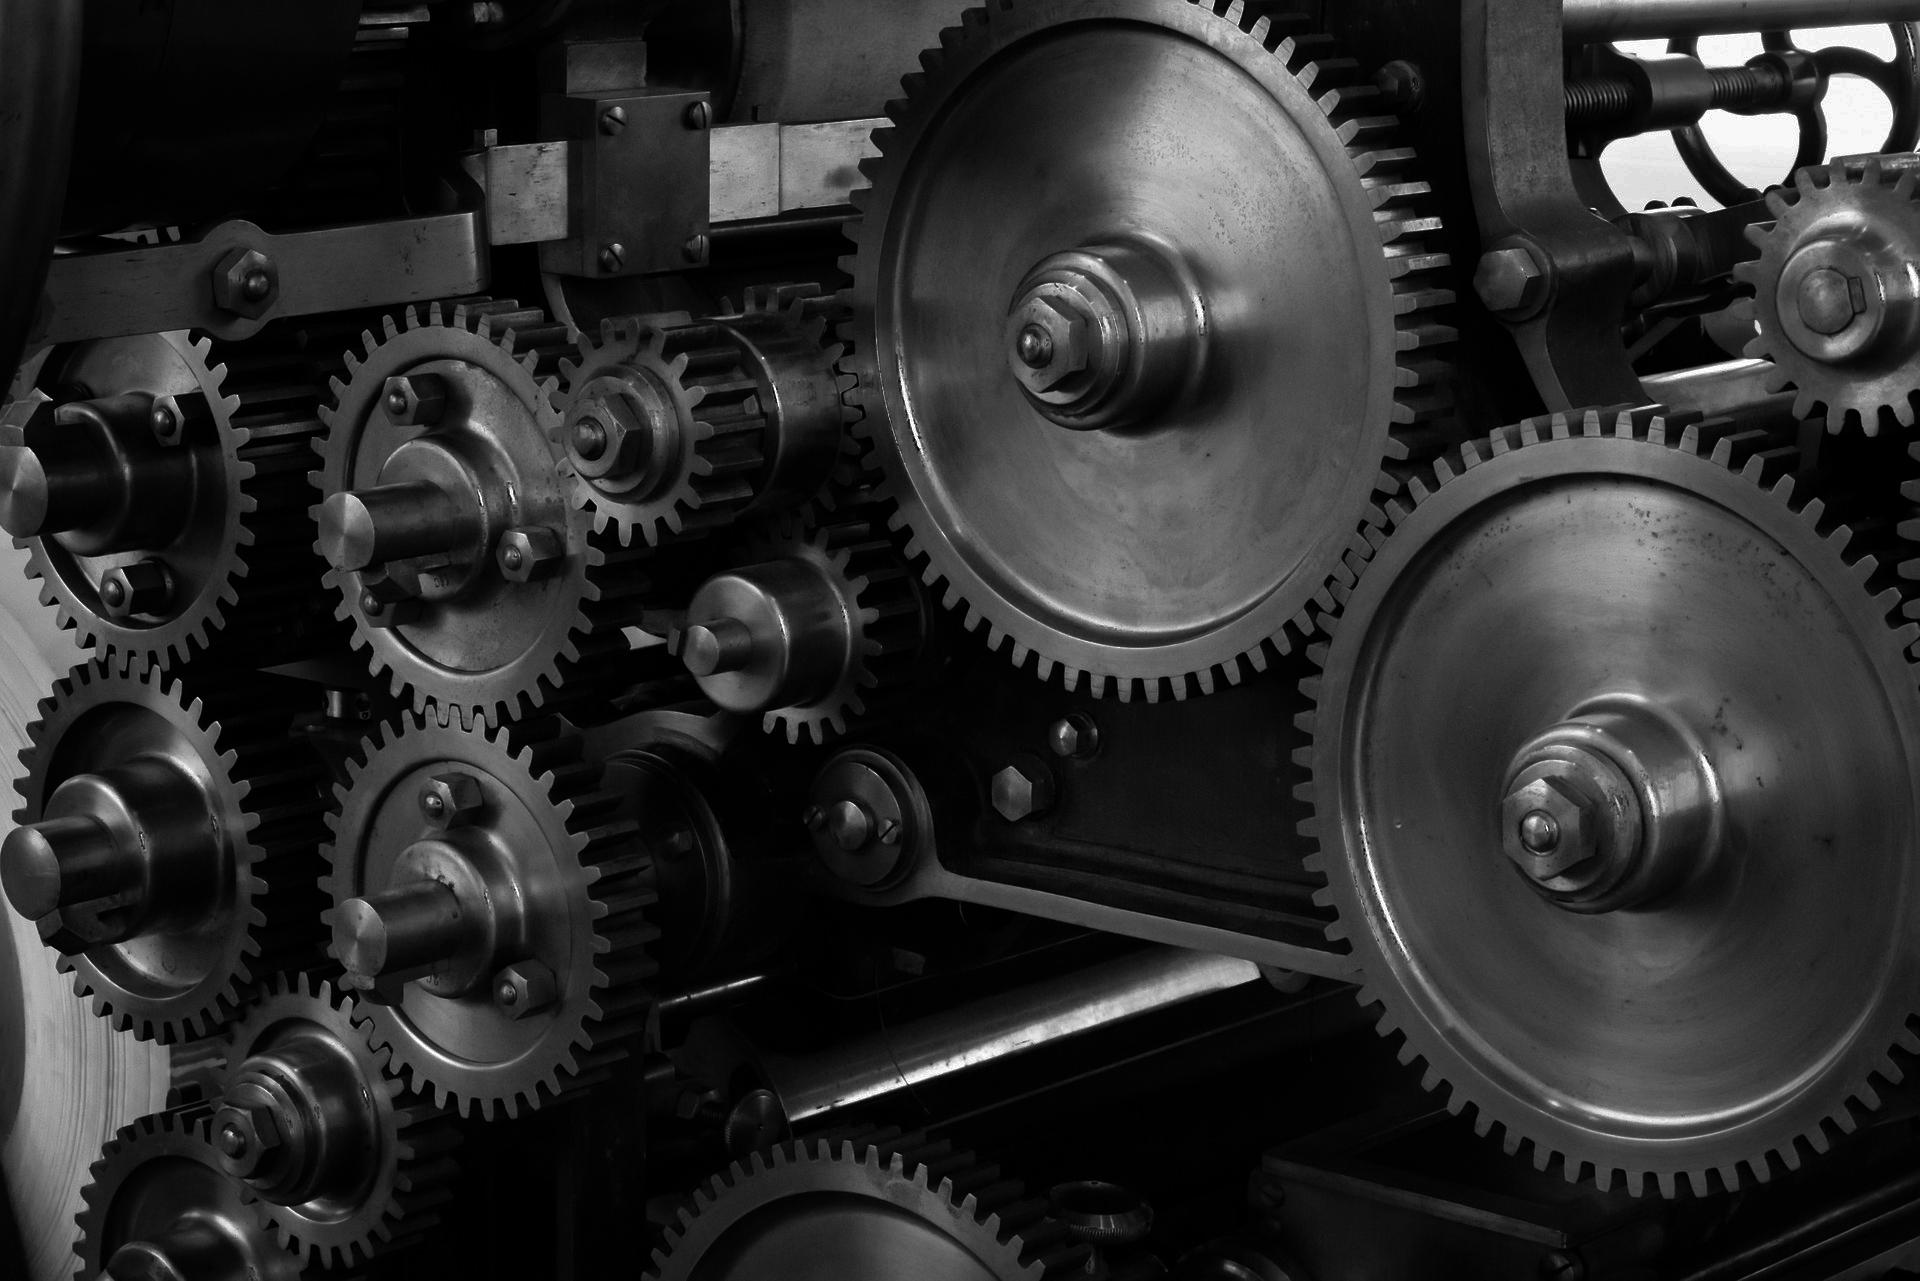 Gears on Machine